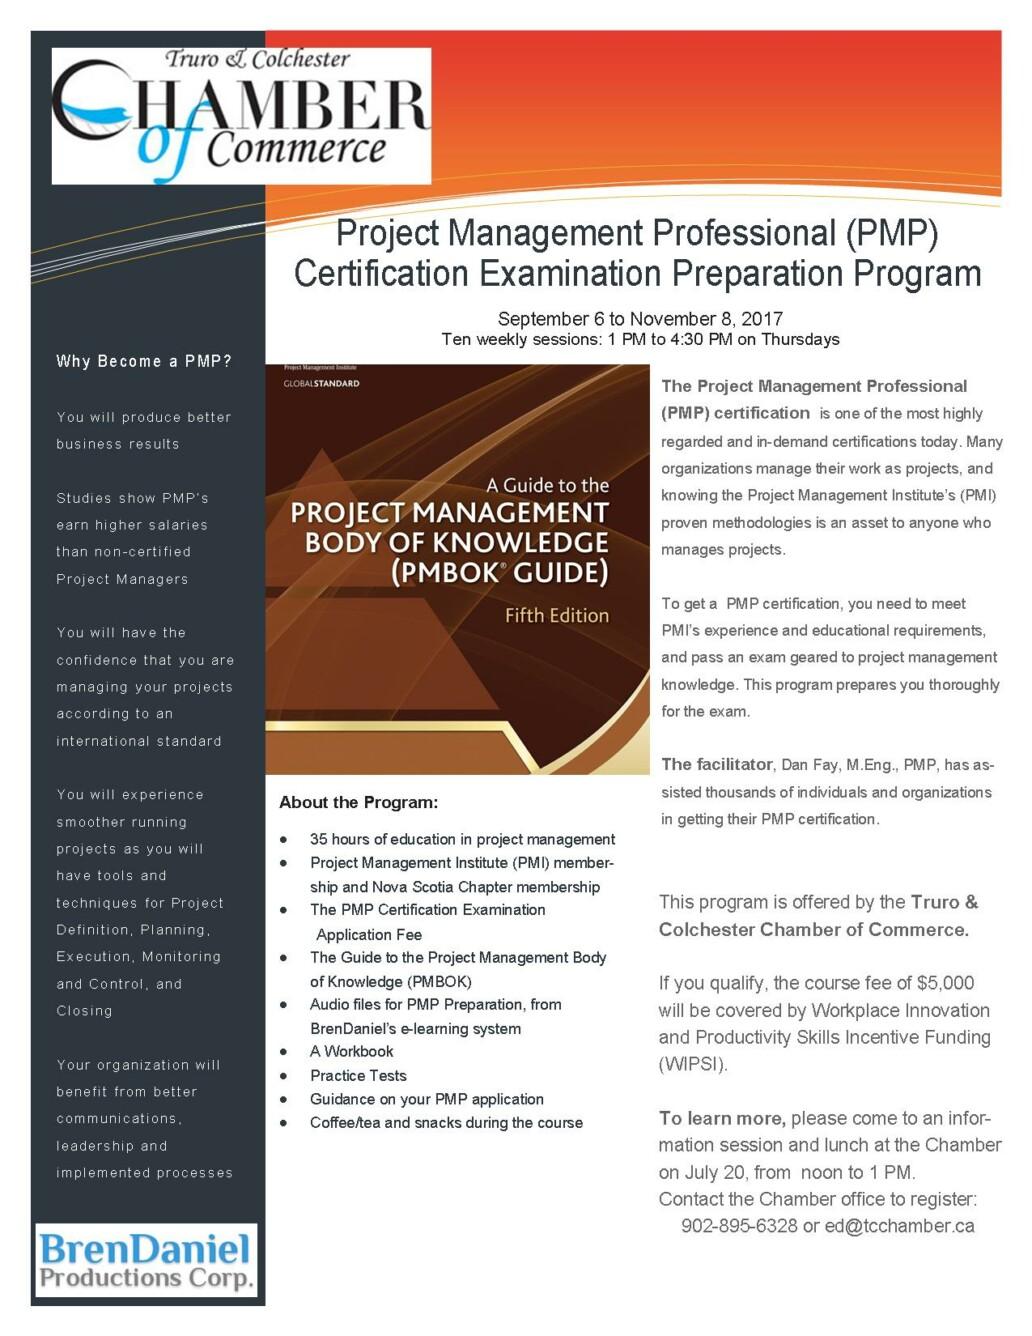 Chamber Hosting Project Management Professional Training Program